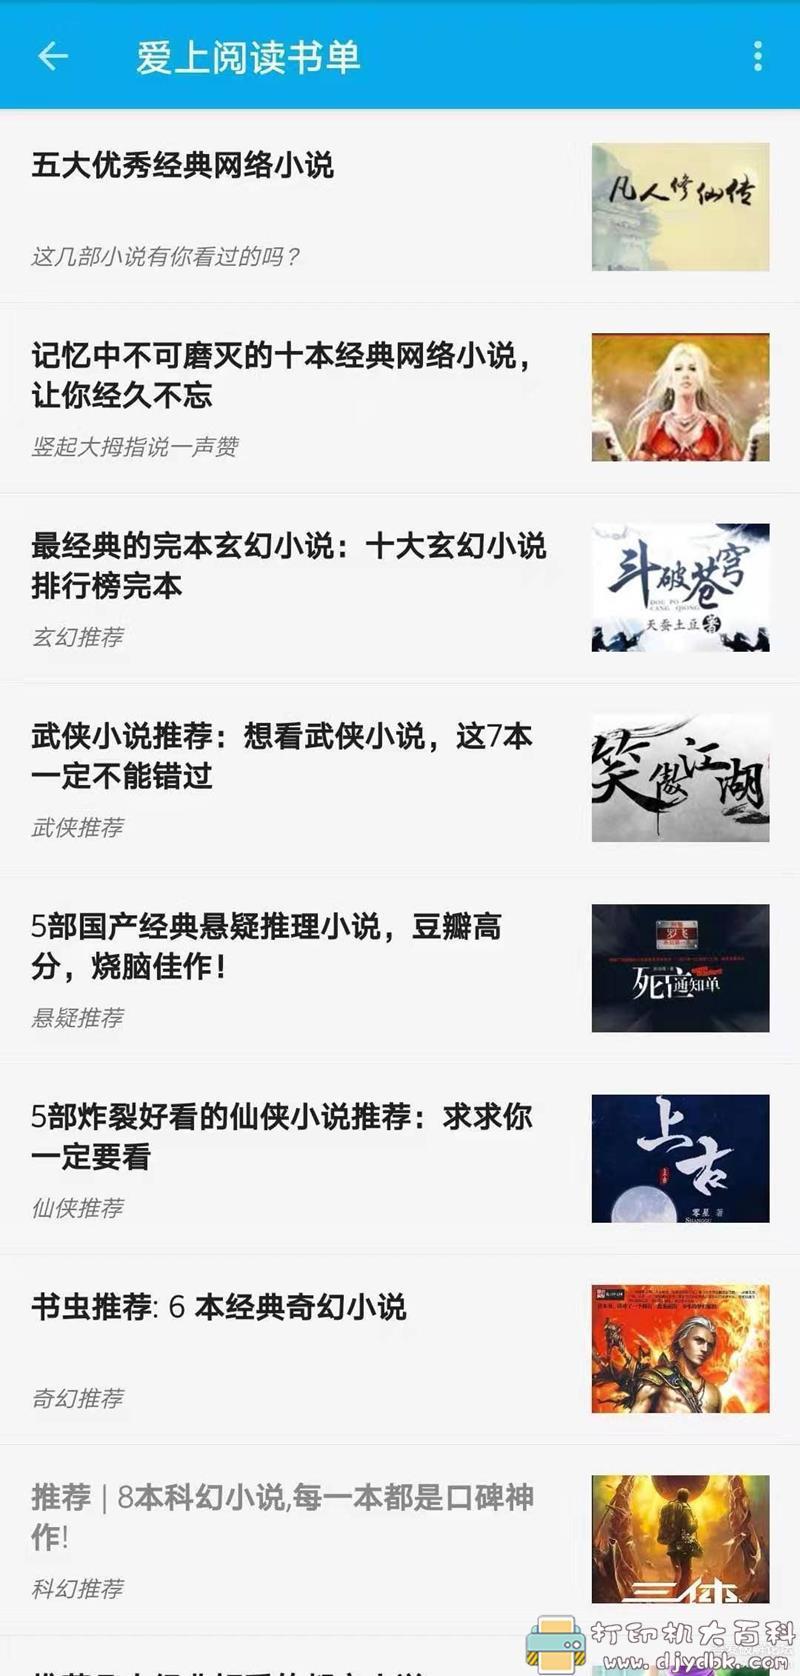 [Android]免费小说软件:爱上看书V1.7 配图 No.5